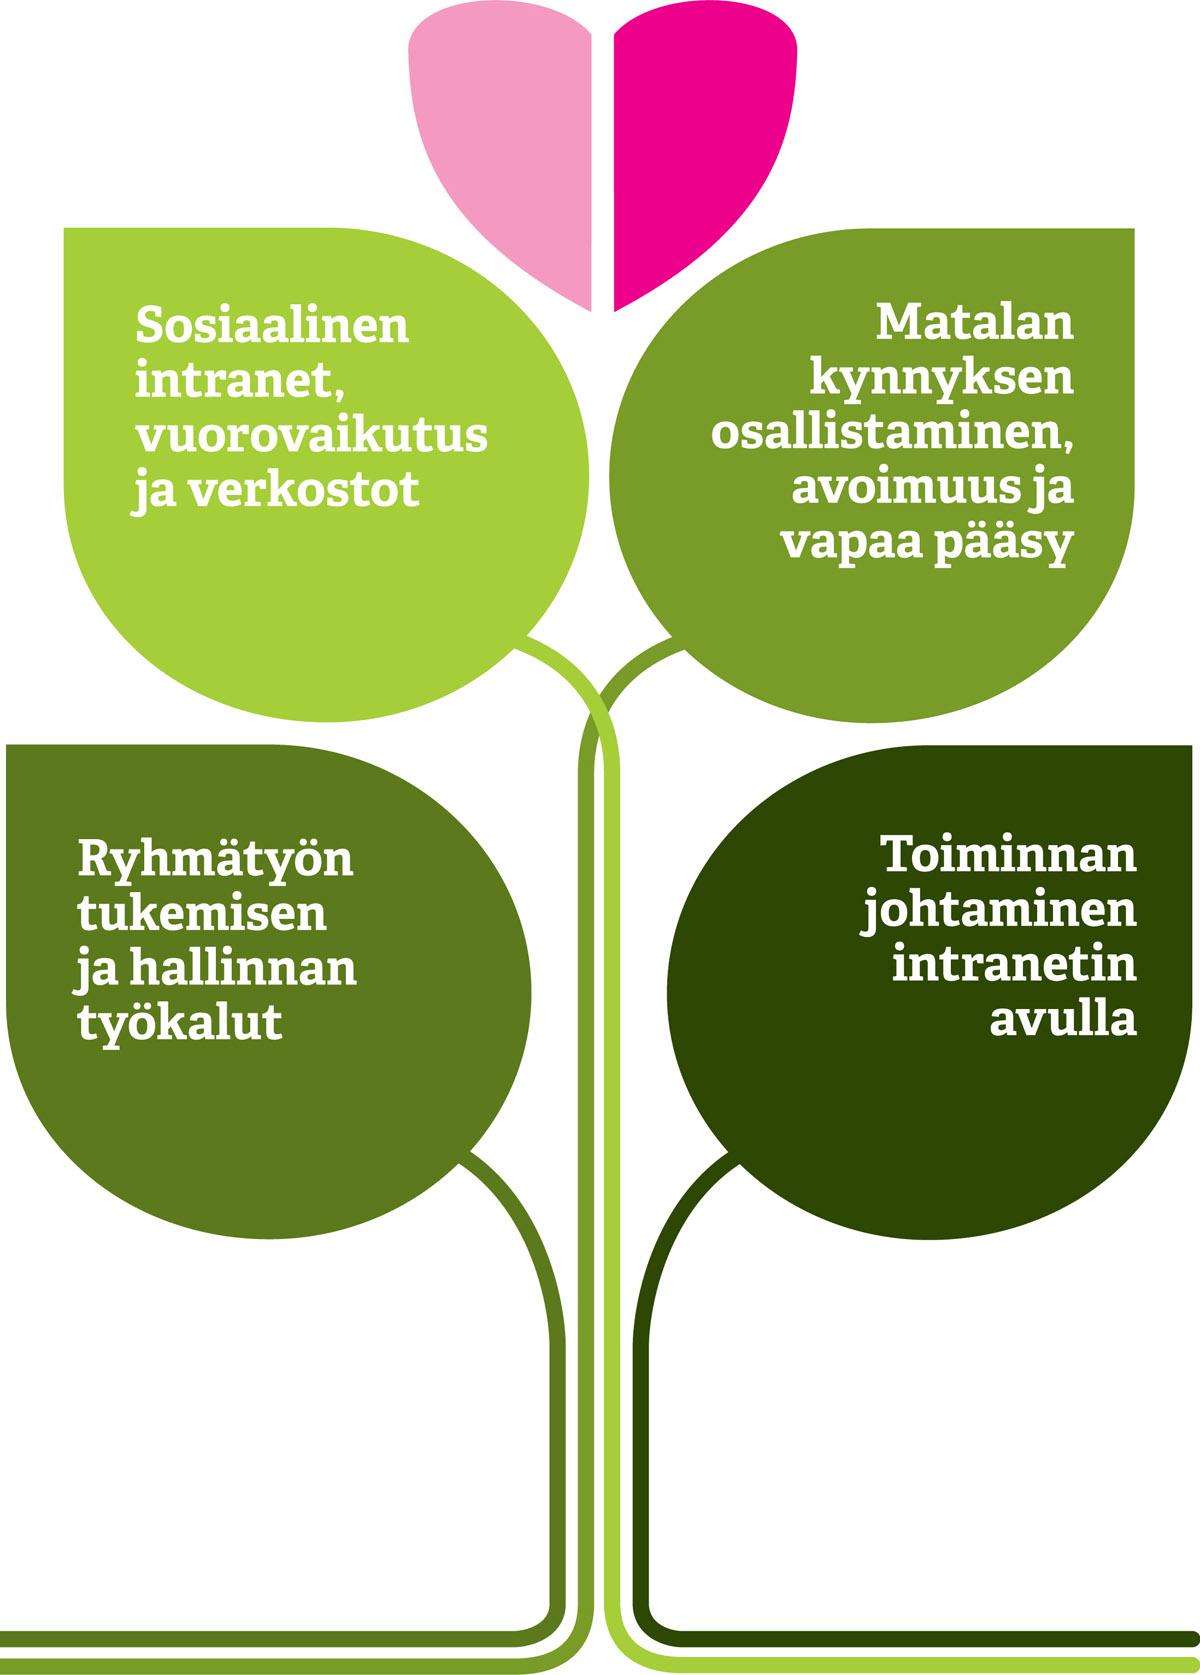 Intranet-palvelut Suomessa 2014, Megatrendit